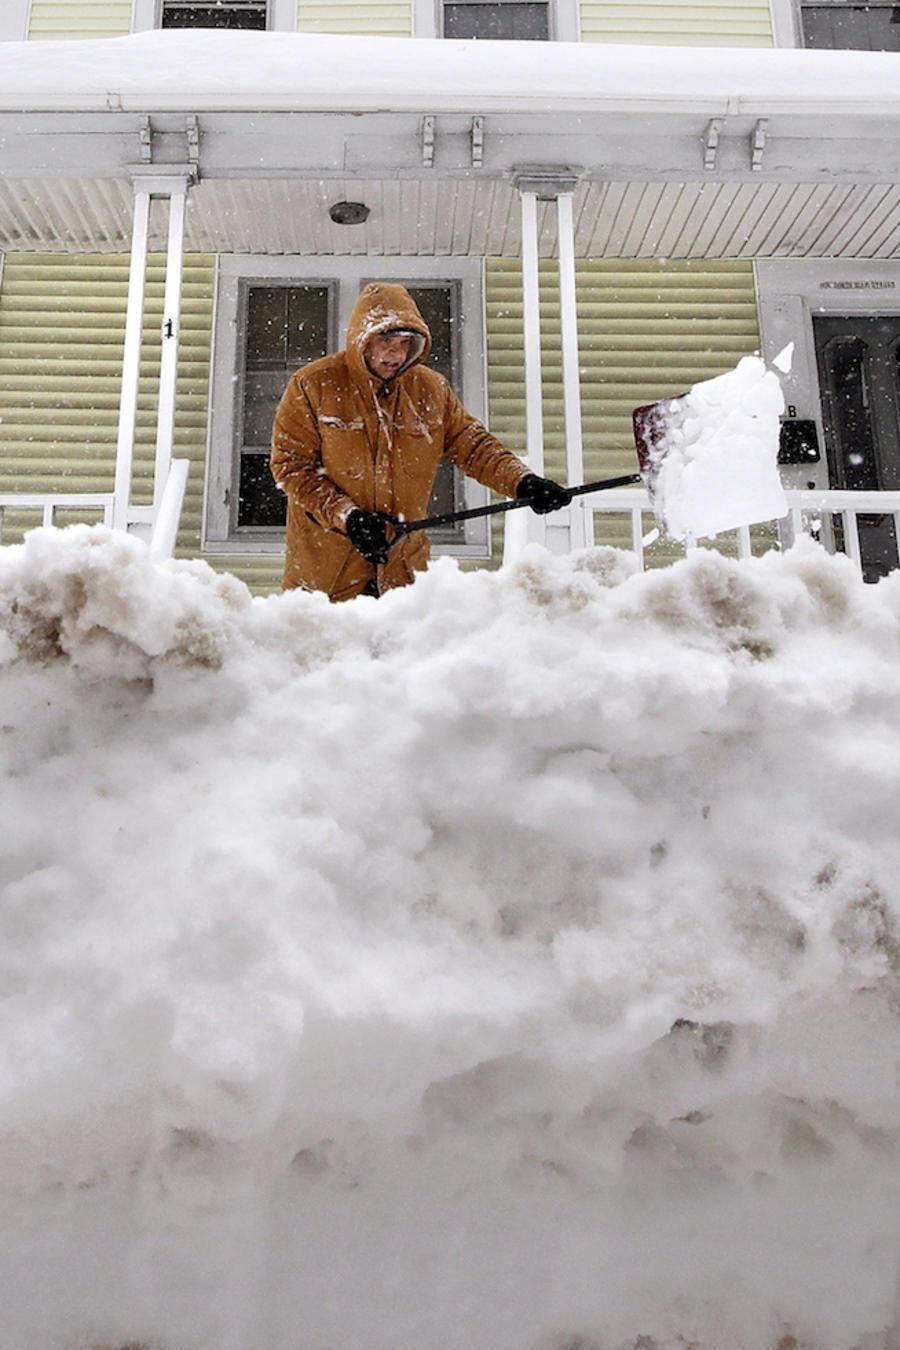 Imagen de archivo de una tormenta de nieve en New Hampshire.